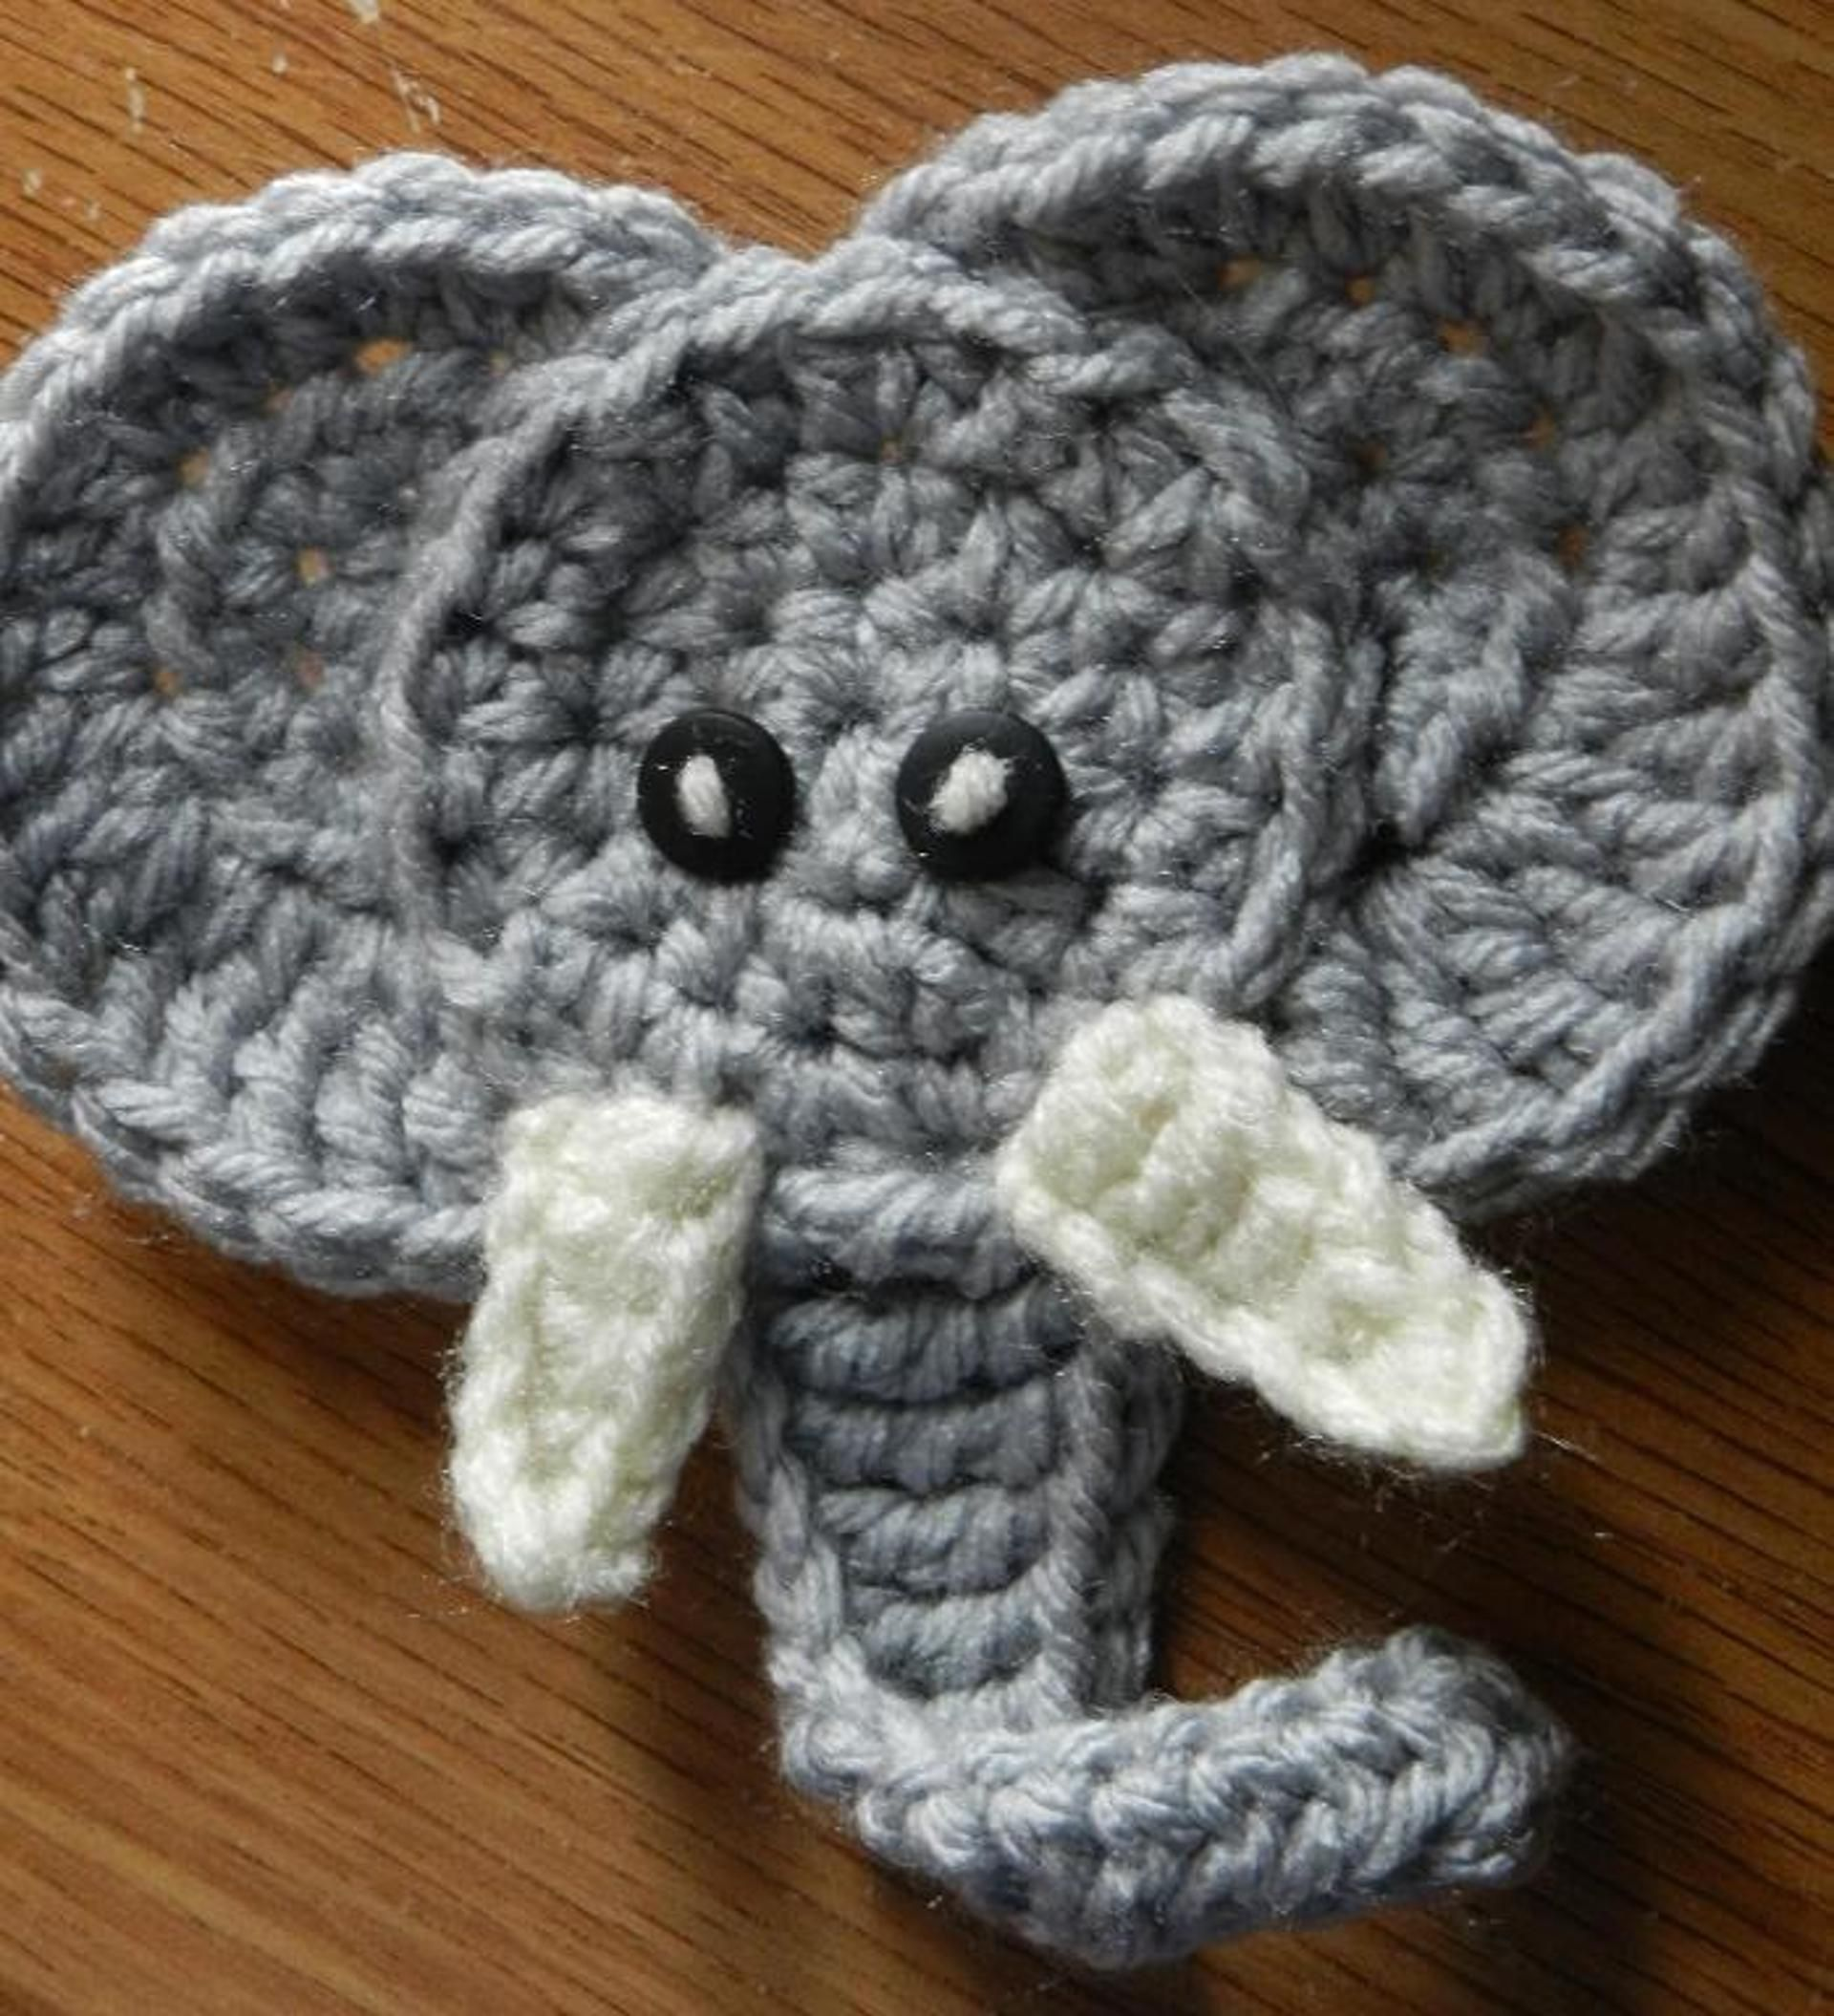 Elephant Applique Elephant Crochet Crochet Patterns Crochet